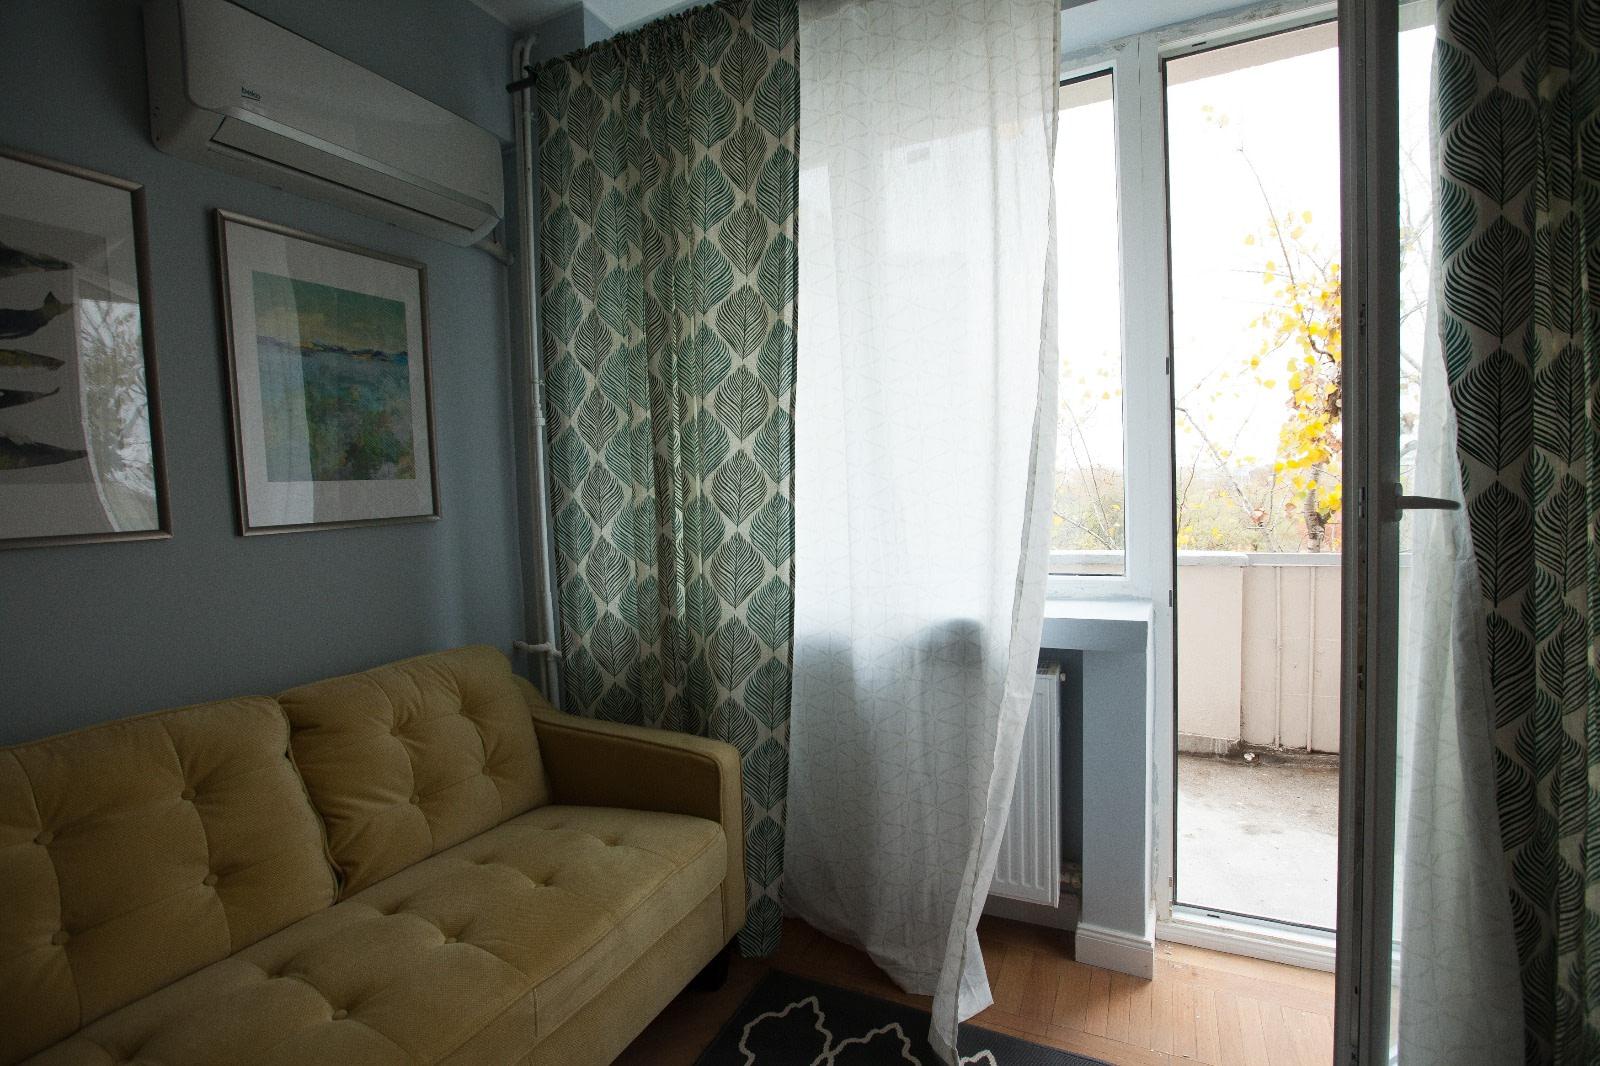 2 Camere Cismigiu Park Brezoianu 1 bedroom